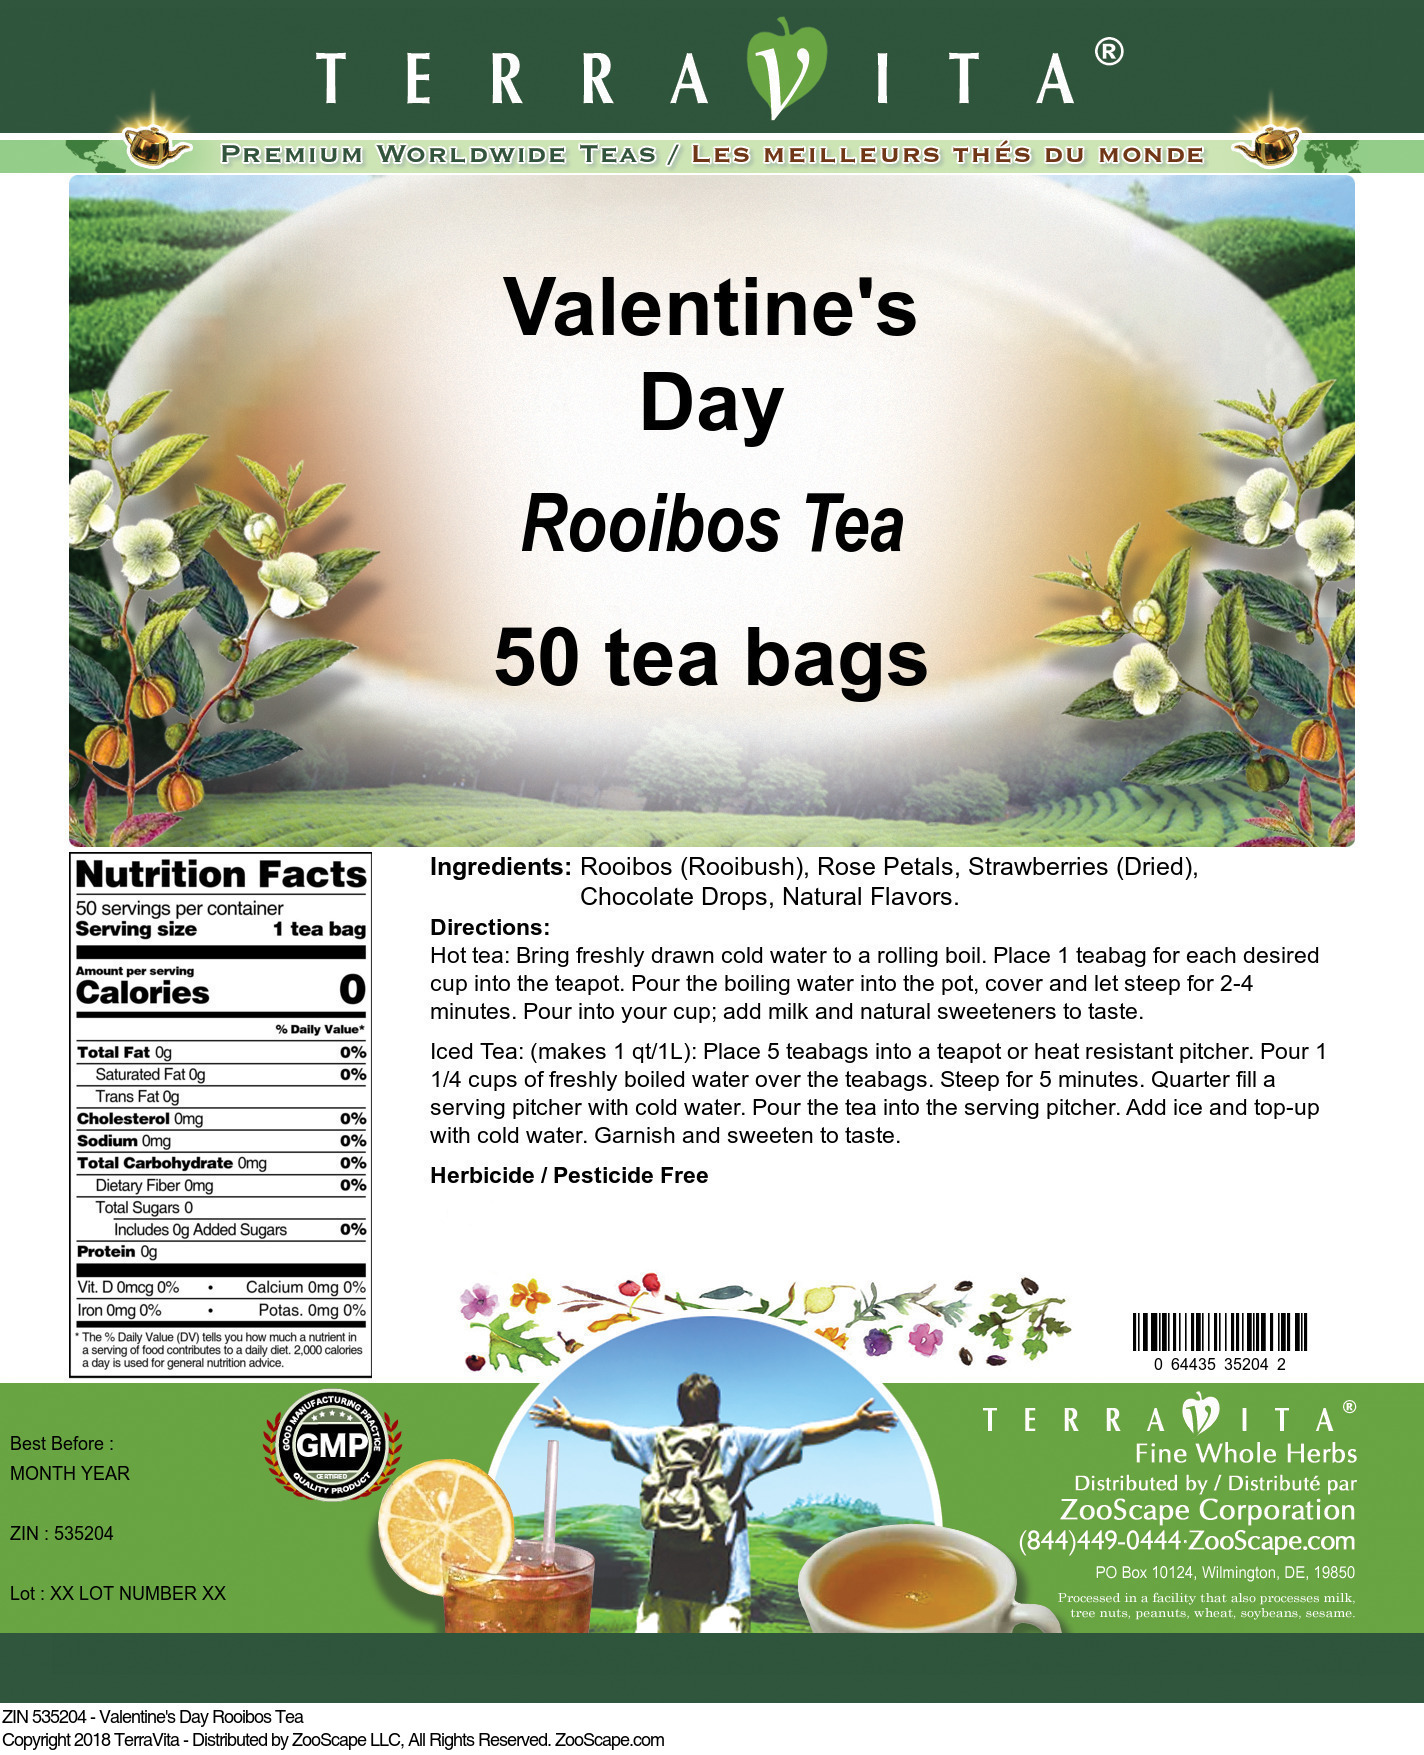 Valentine's Day Rooibos Tea